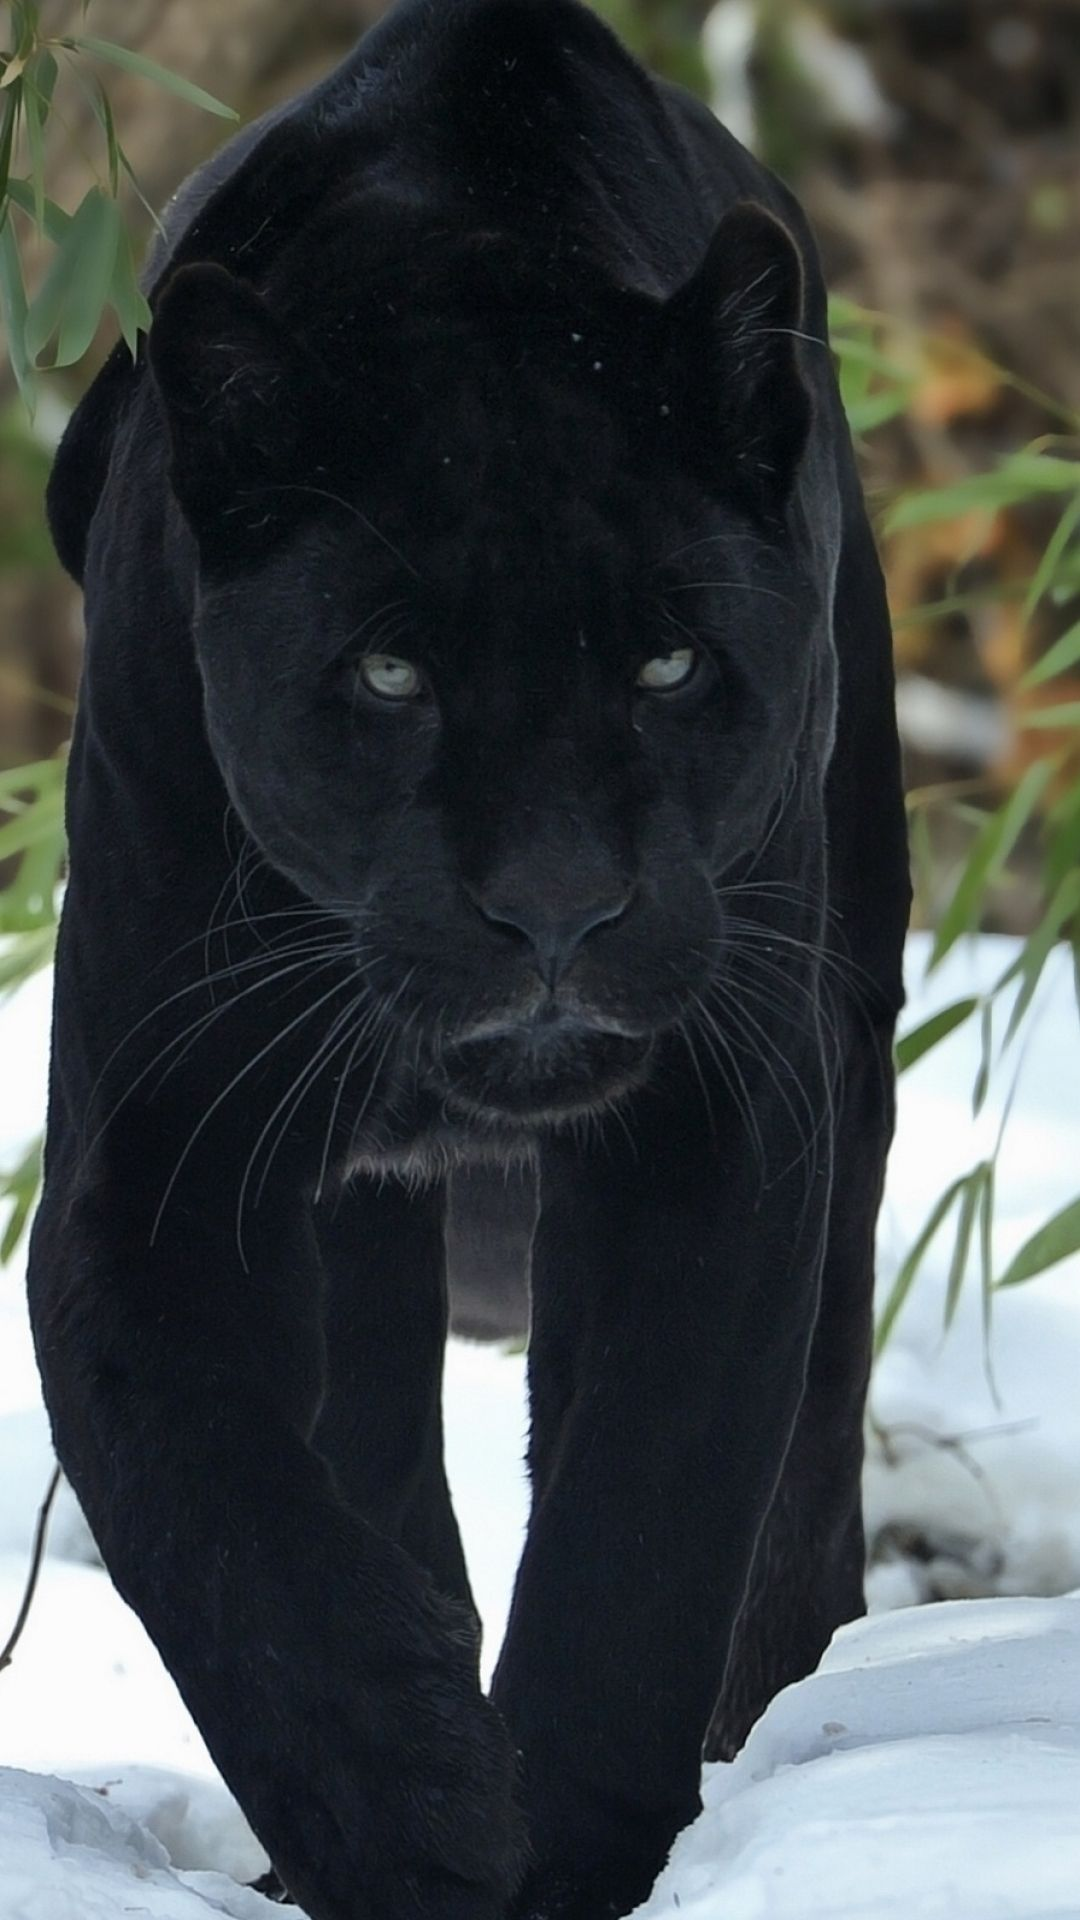 Black Panther Animal Iphone Wallpapers Top Free Black Panther Animal Iphone Backgrounds Wallpaperaccess